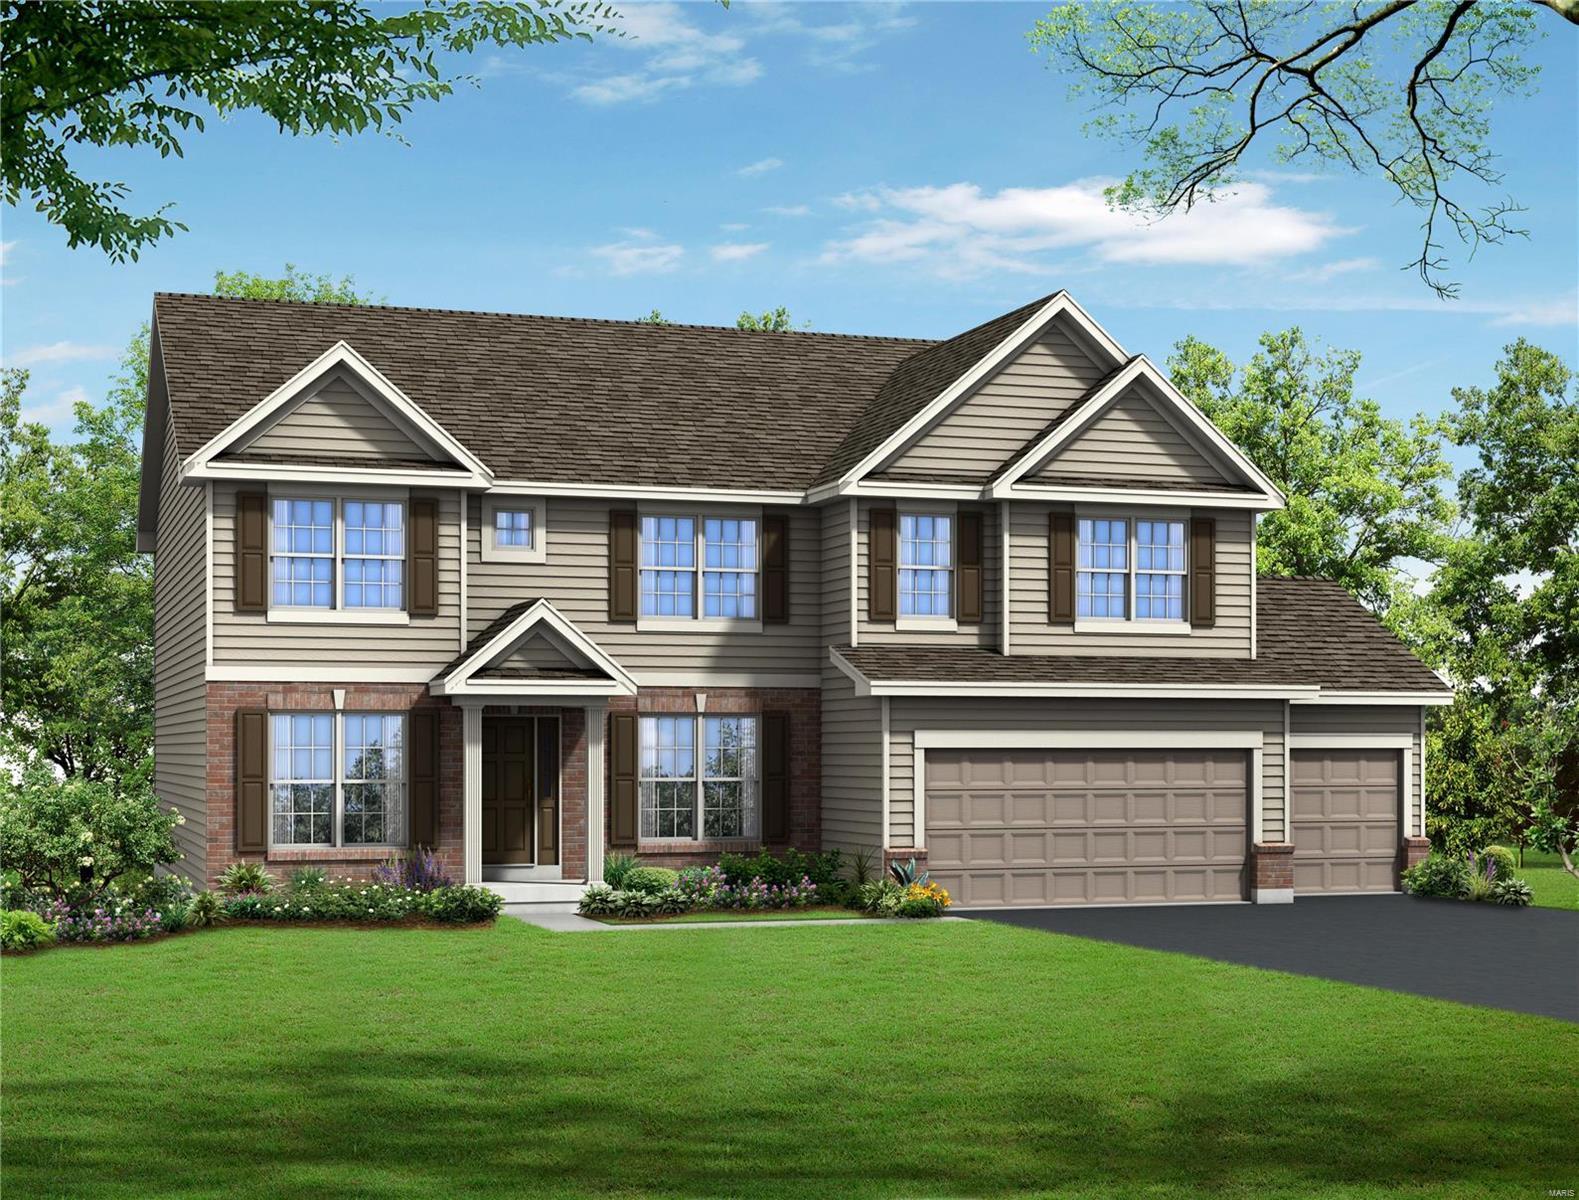 2 Westlake / Westhampton Model Property Photo - Pacific, MO real estate listing